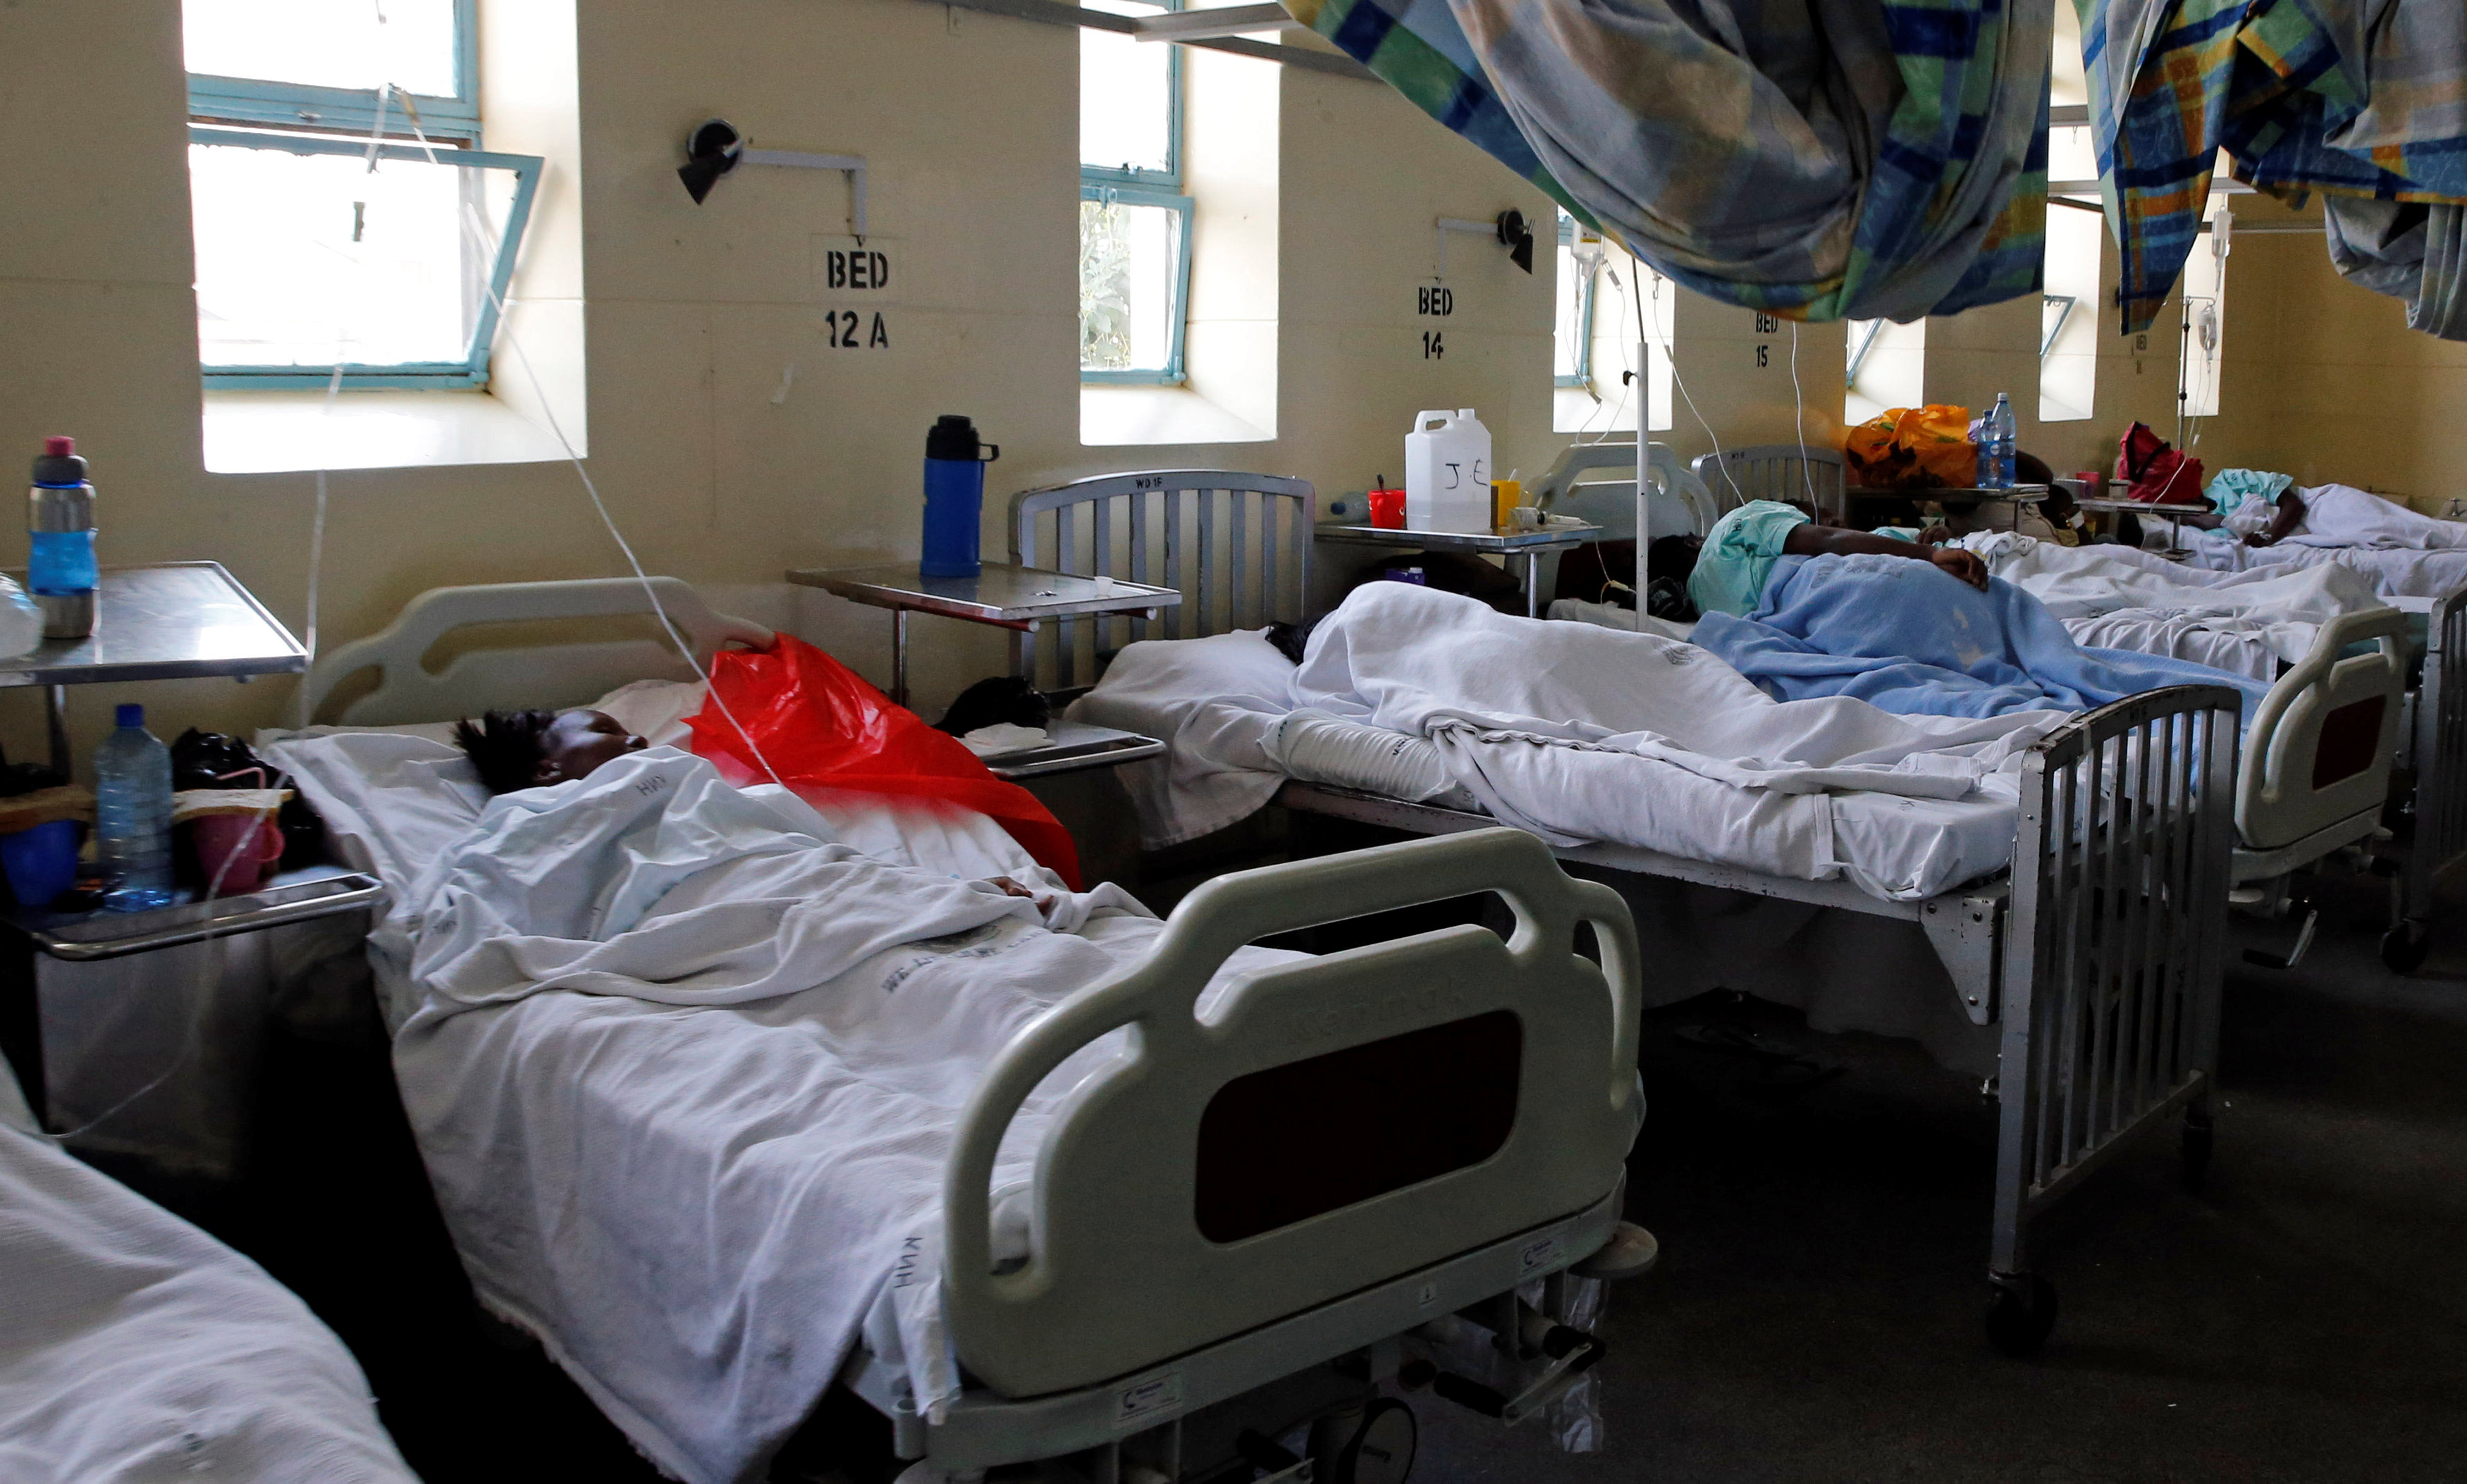 Cholera patients receive treatment and care inside a special ward at the Kenyatta National Hospital in Nairobi, Kenya July 19, 2017. REUTERS/Thomas Mukoya